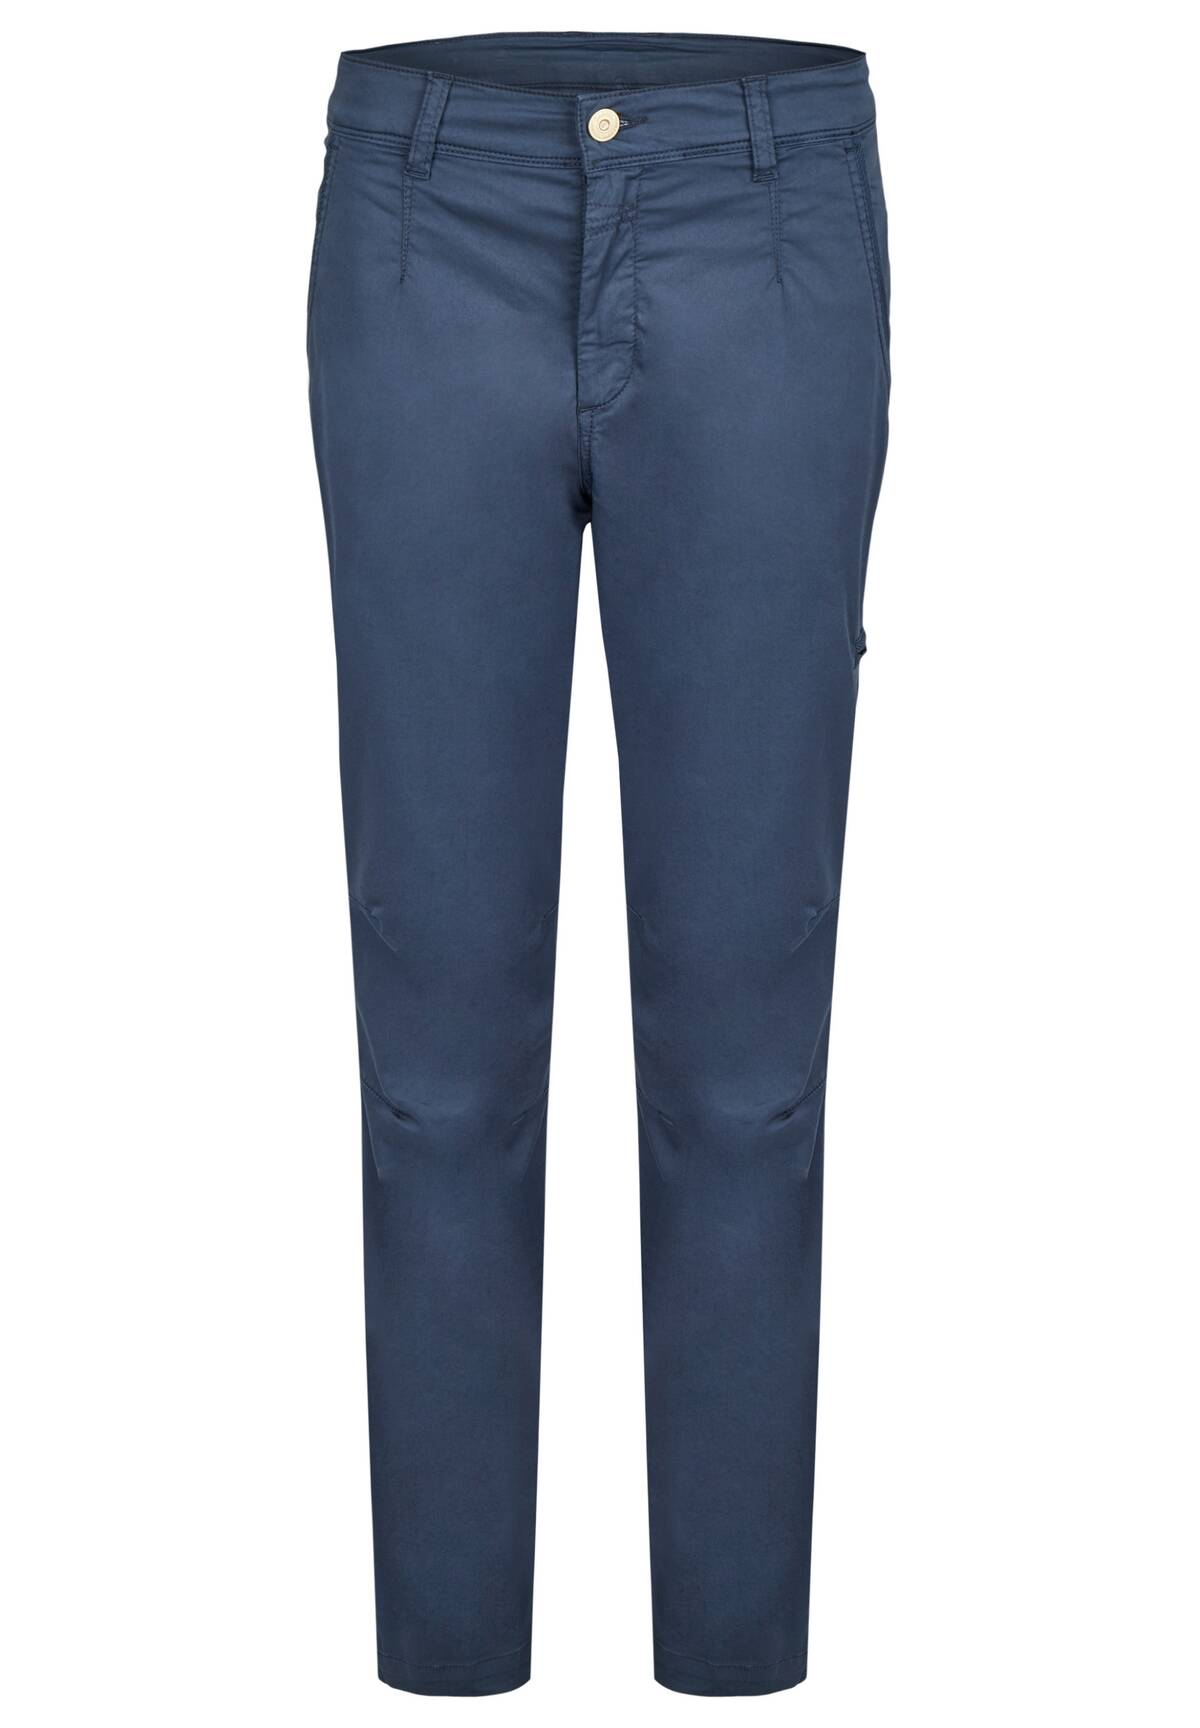 Sportive Hose / Cargo Pants